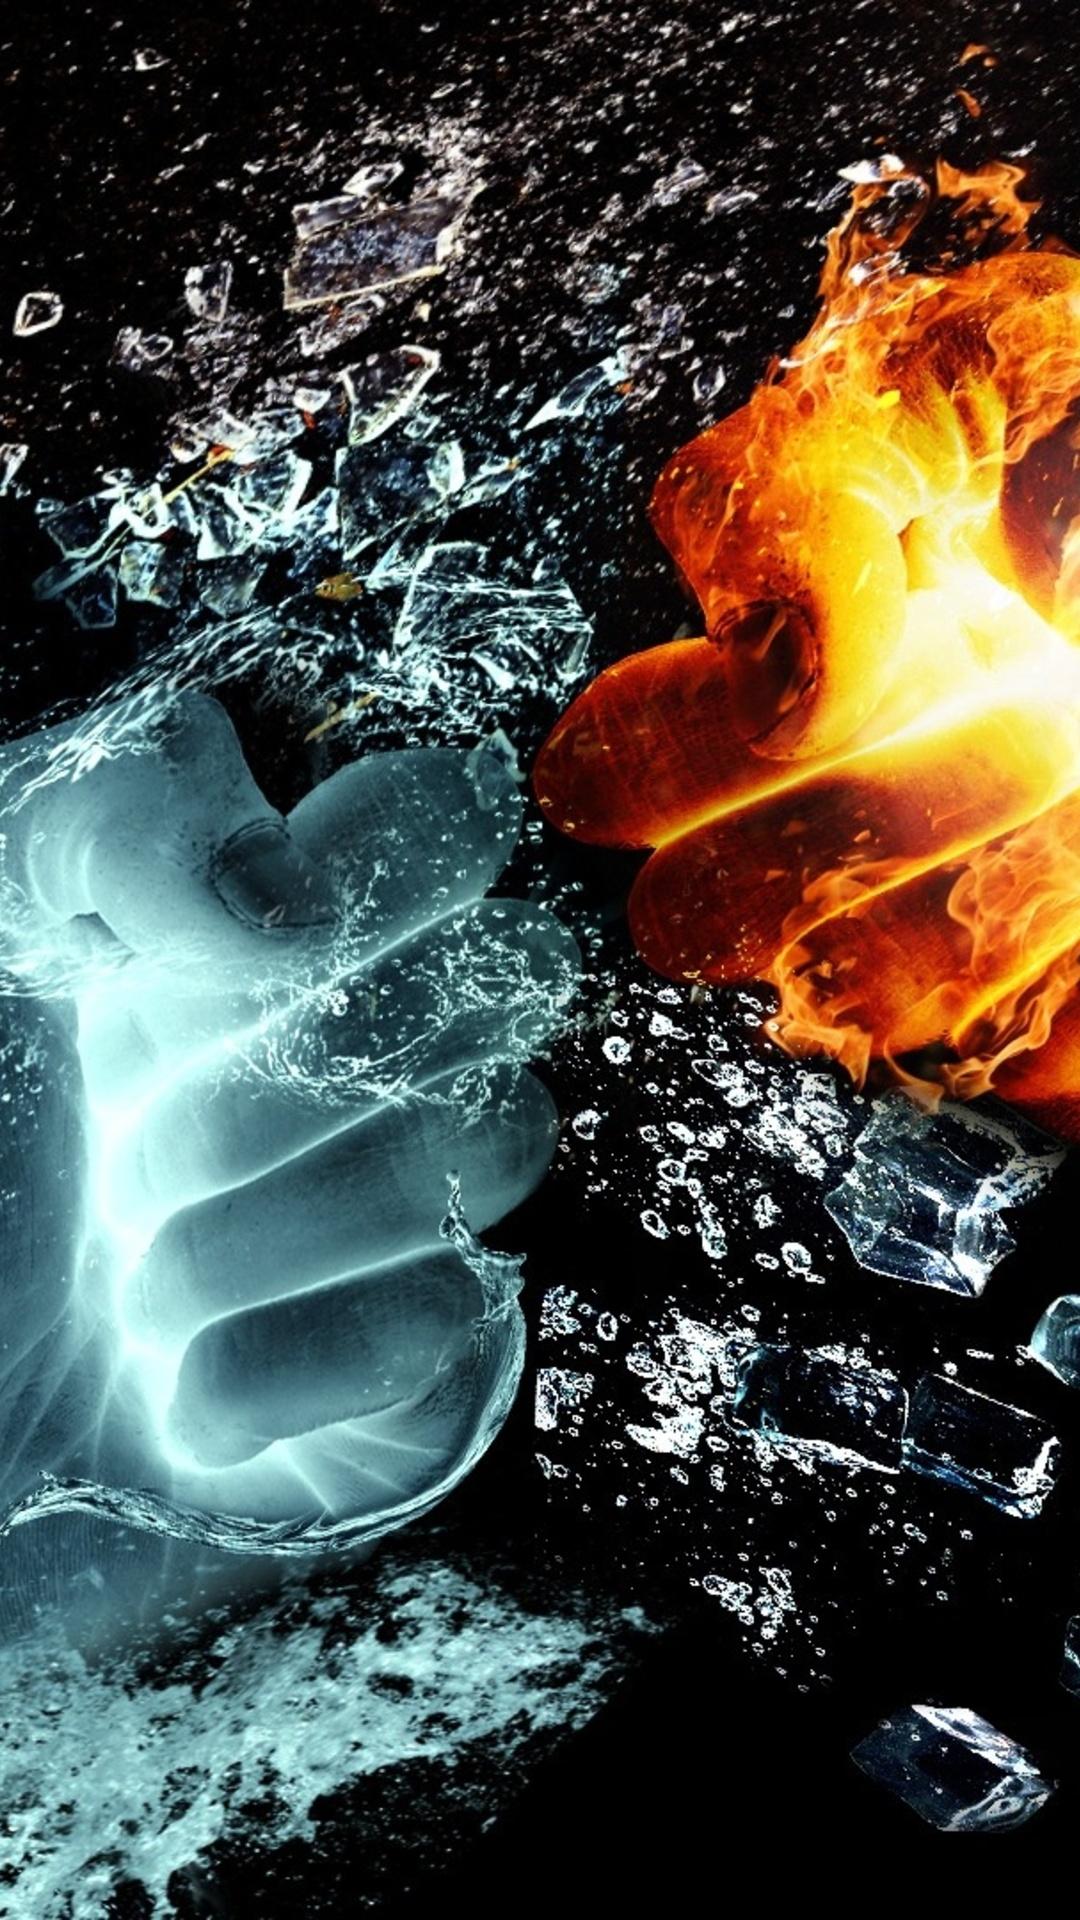 ice-vs-heat-w9.jpg